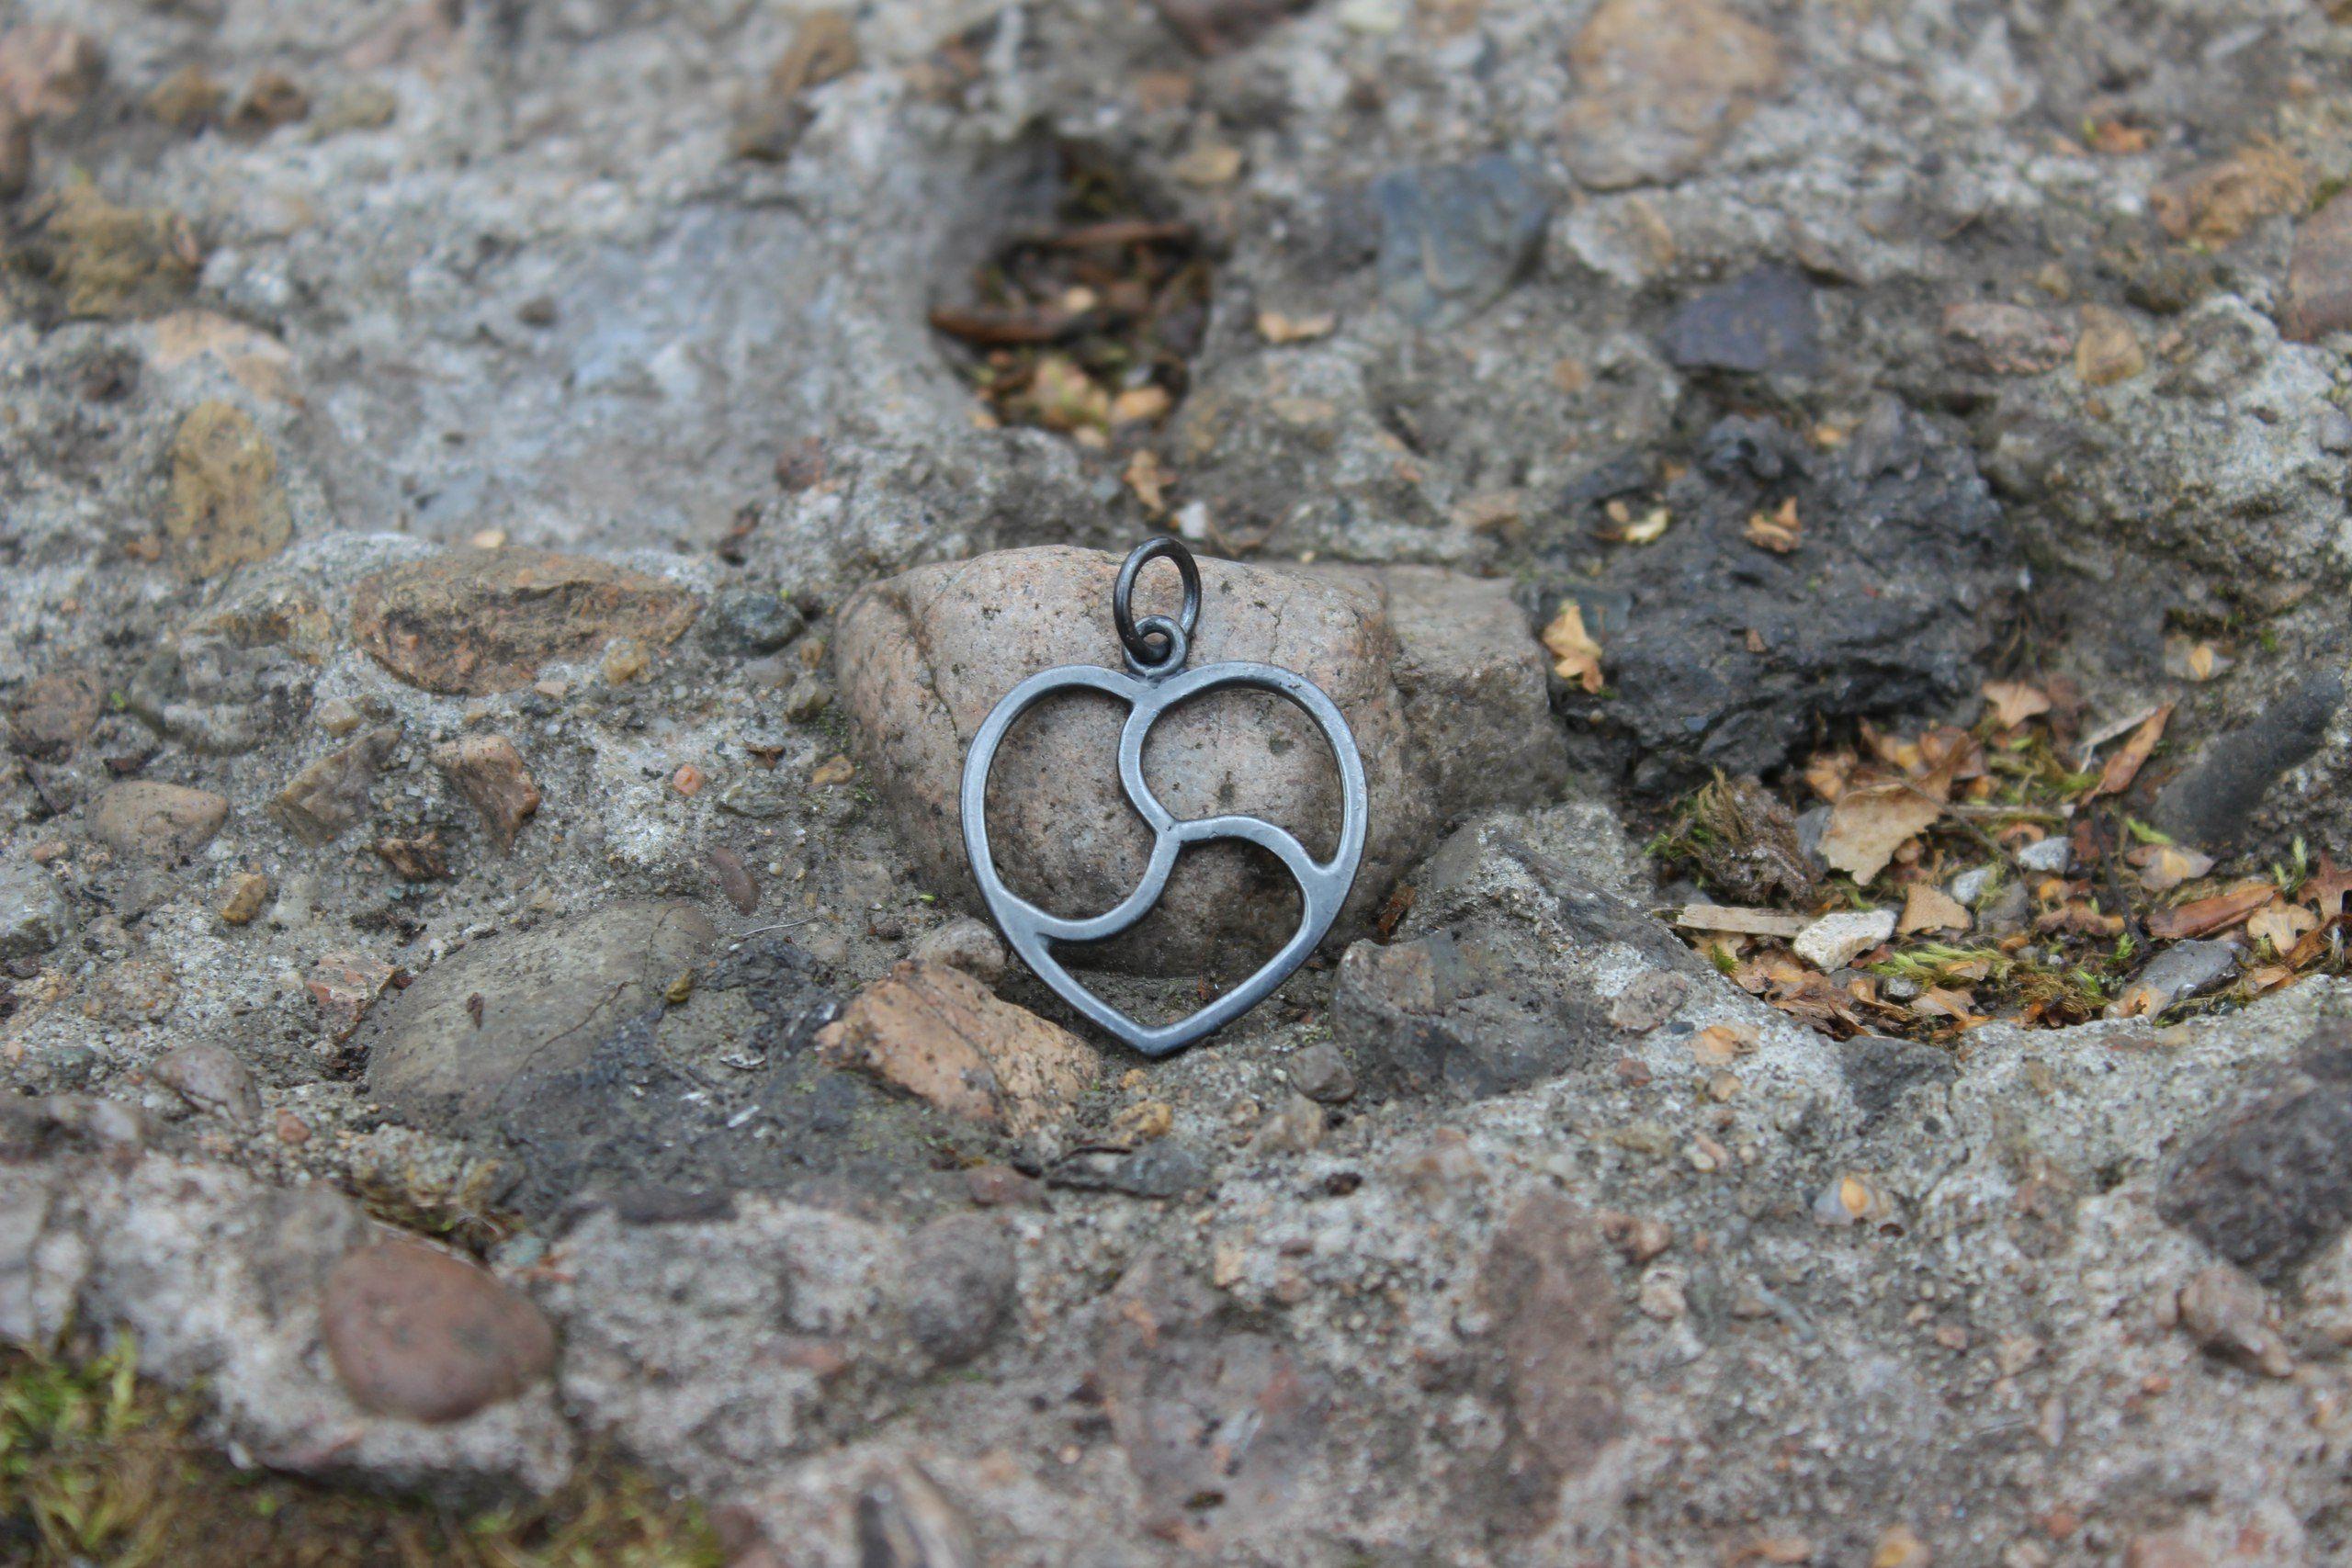 Black silver heart bdsm emblem pendant jewelery pinterest black silver heart bdsm emblem pendant biocorpaavc Gallery